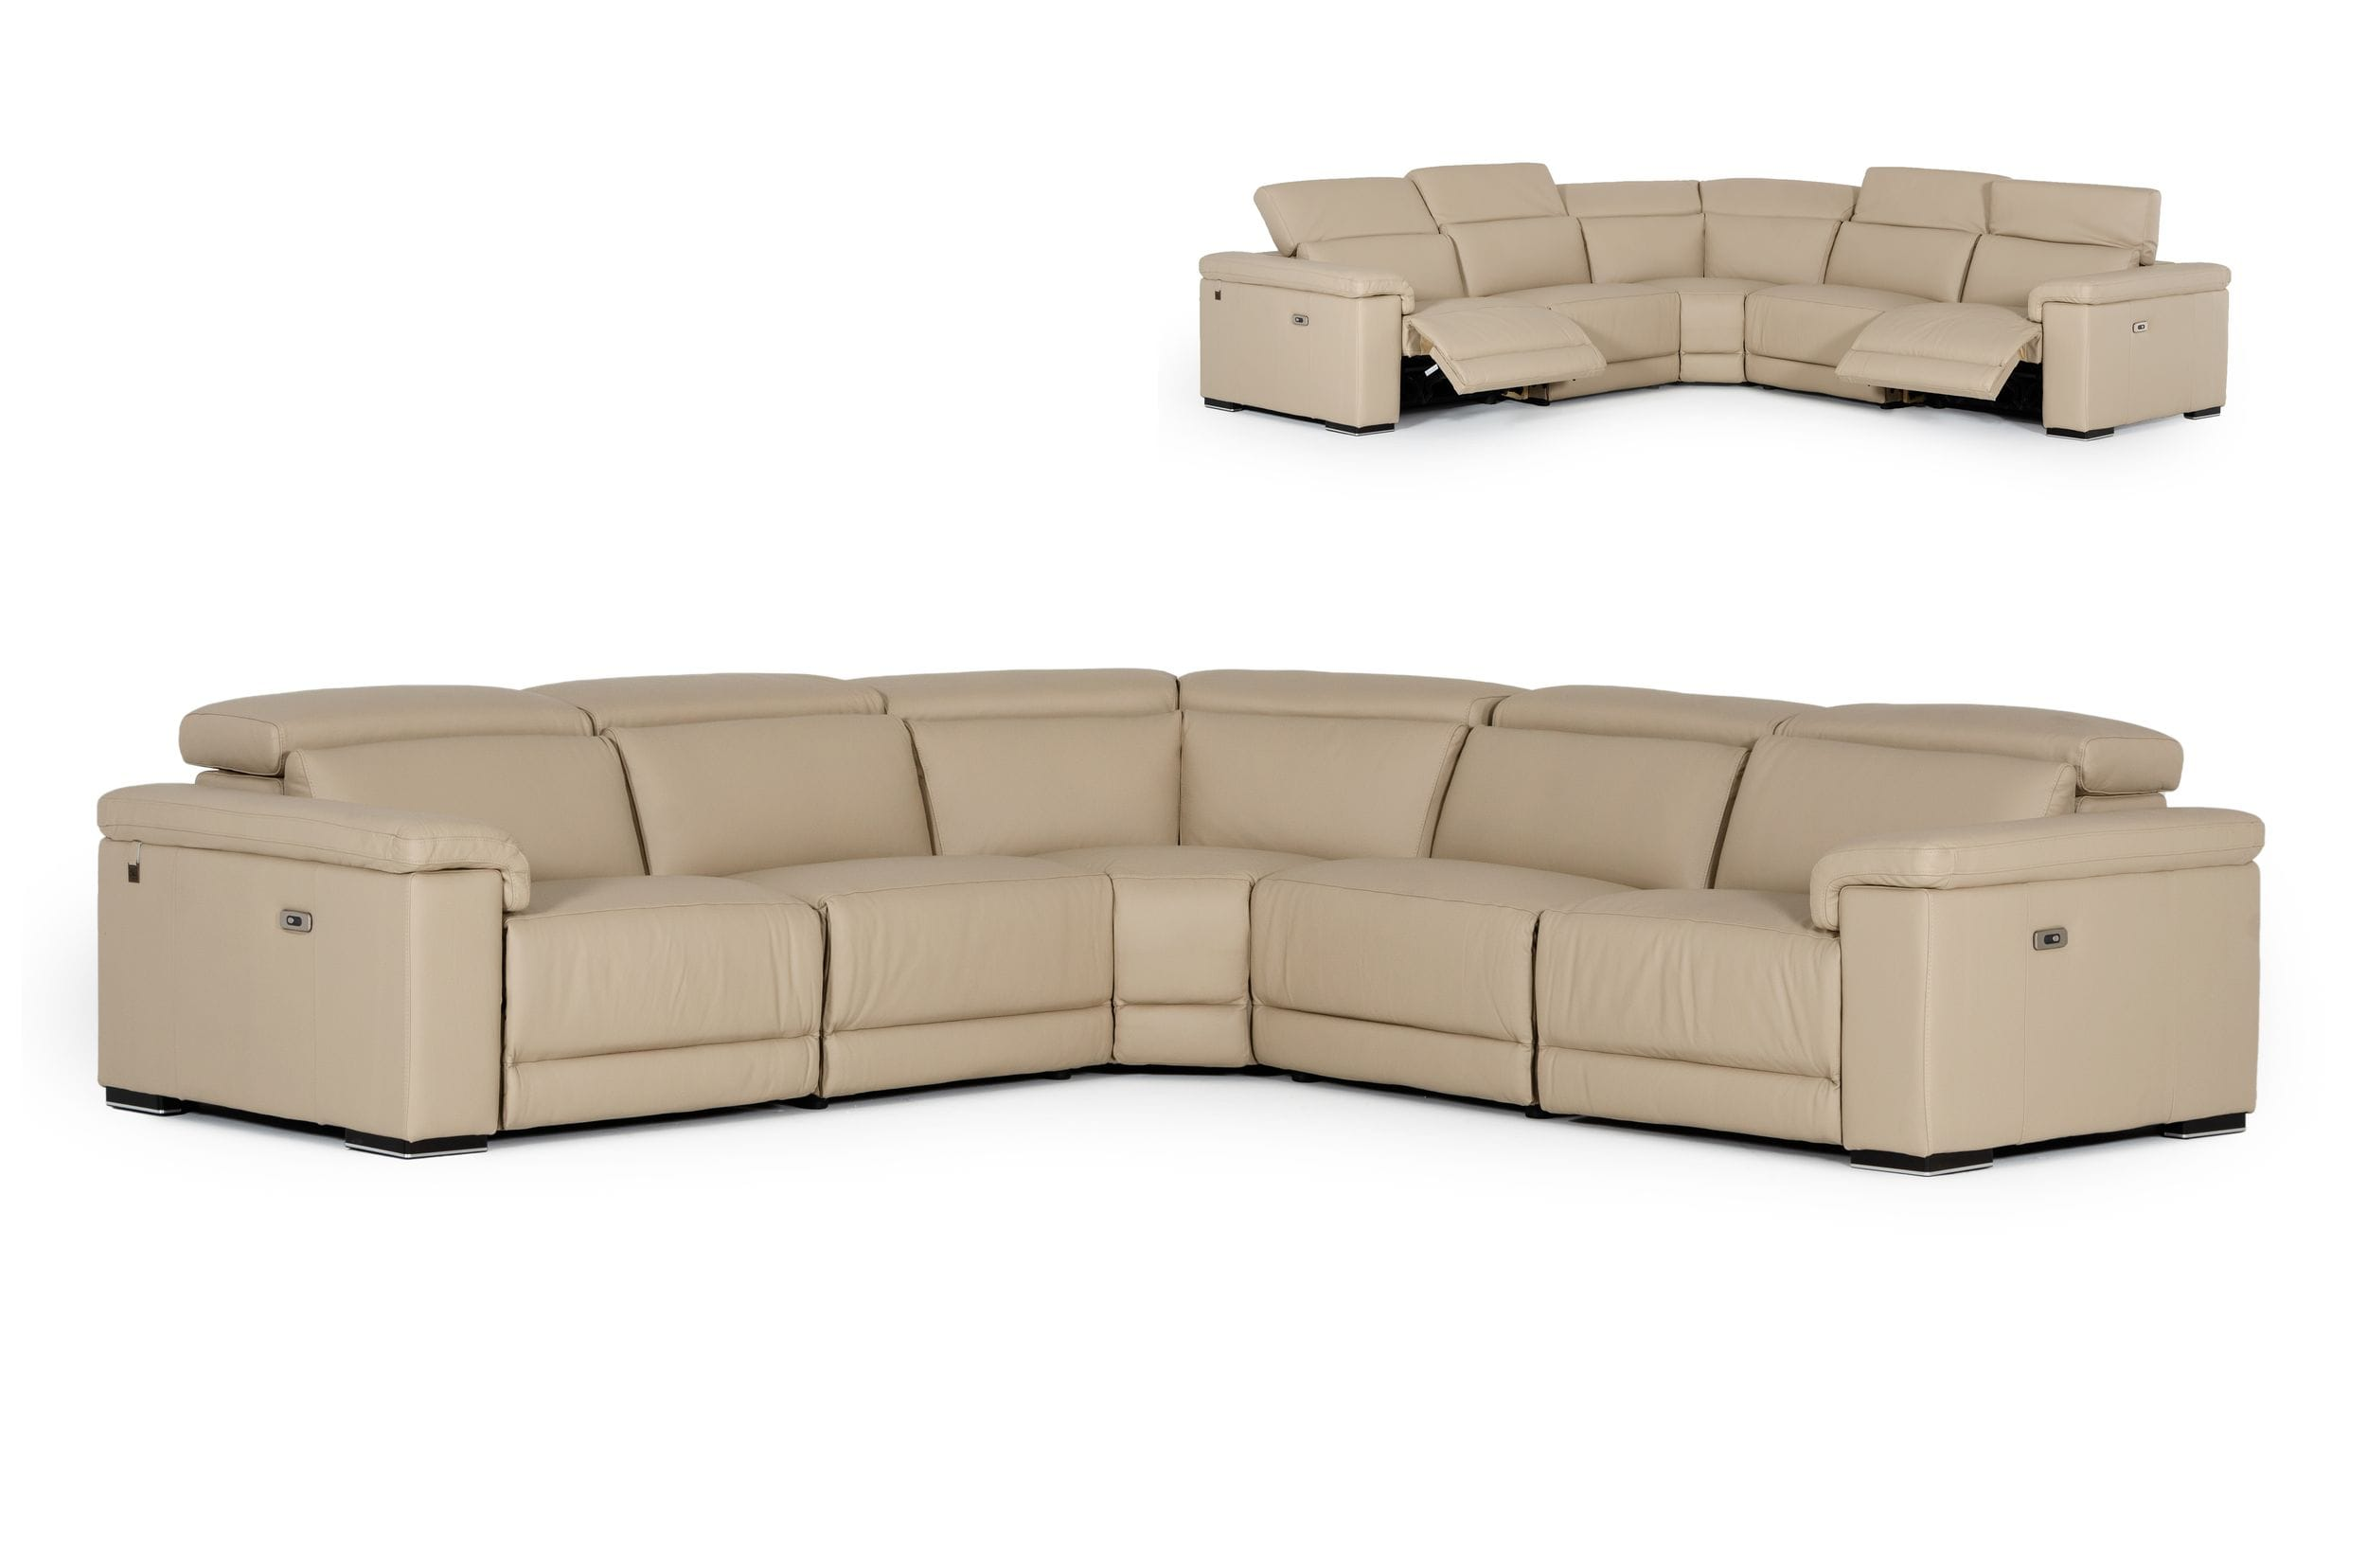 VIG Furniture Estro Salotti Palinuro Taupe Italian Leather Sectional Sofa with Recliners